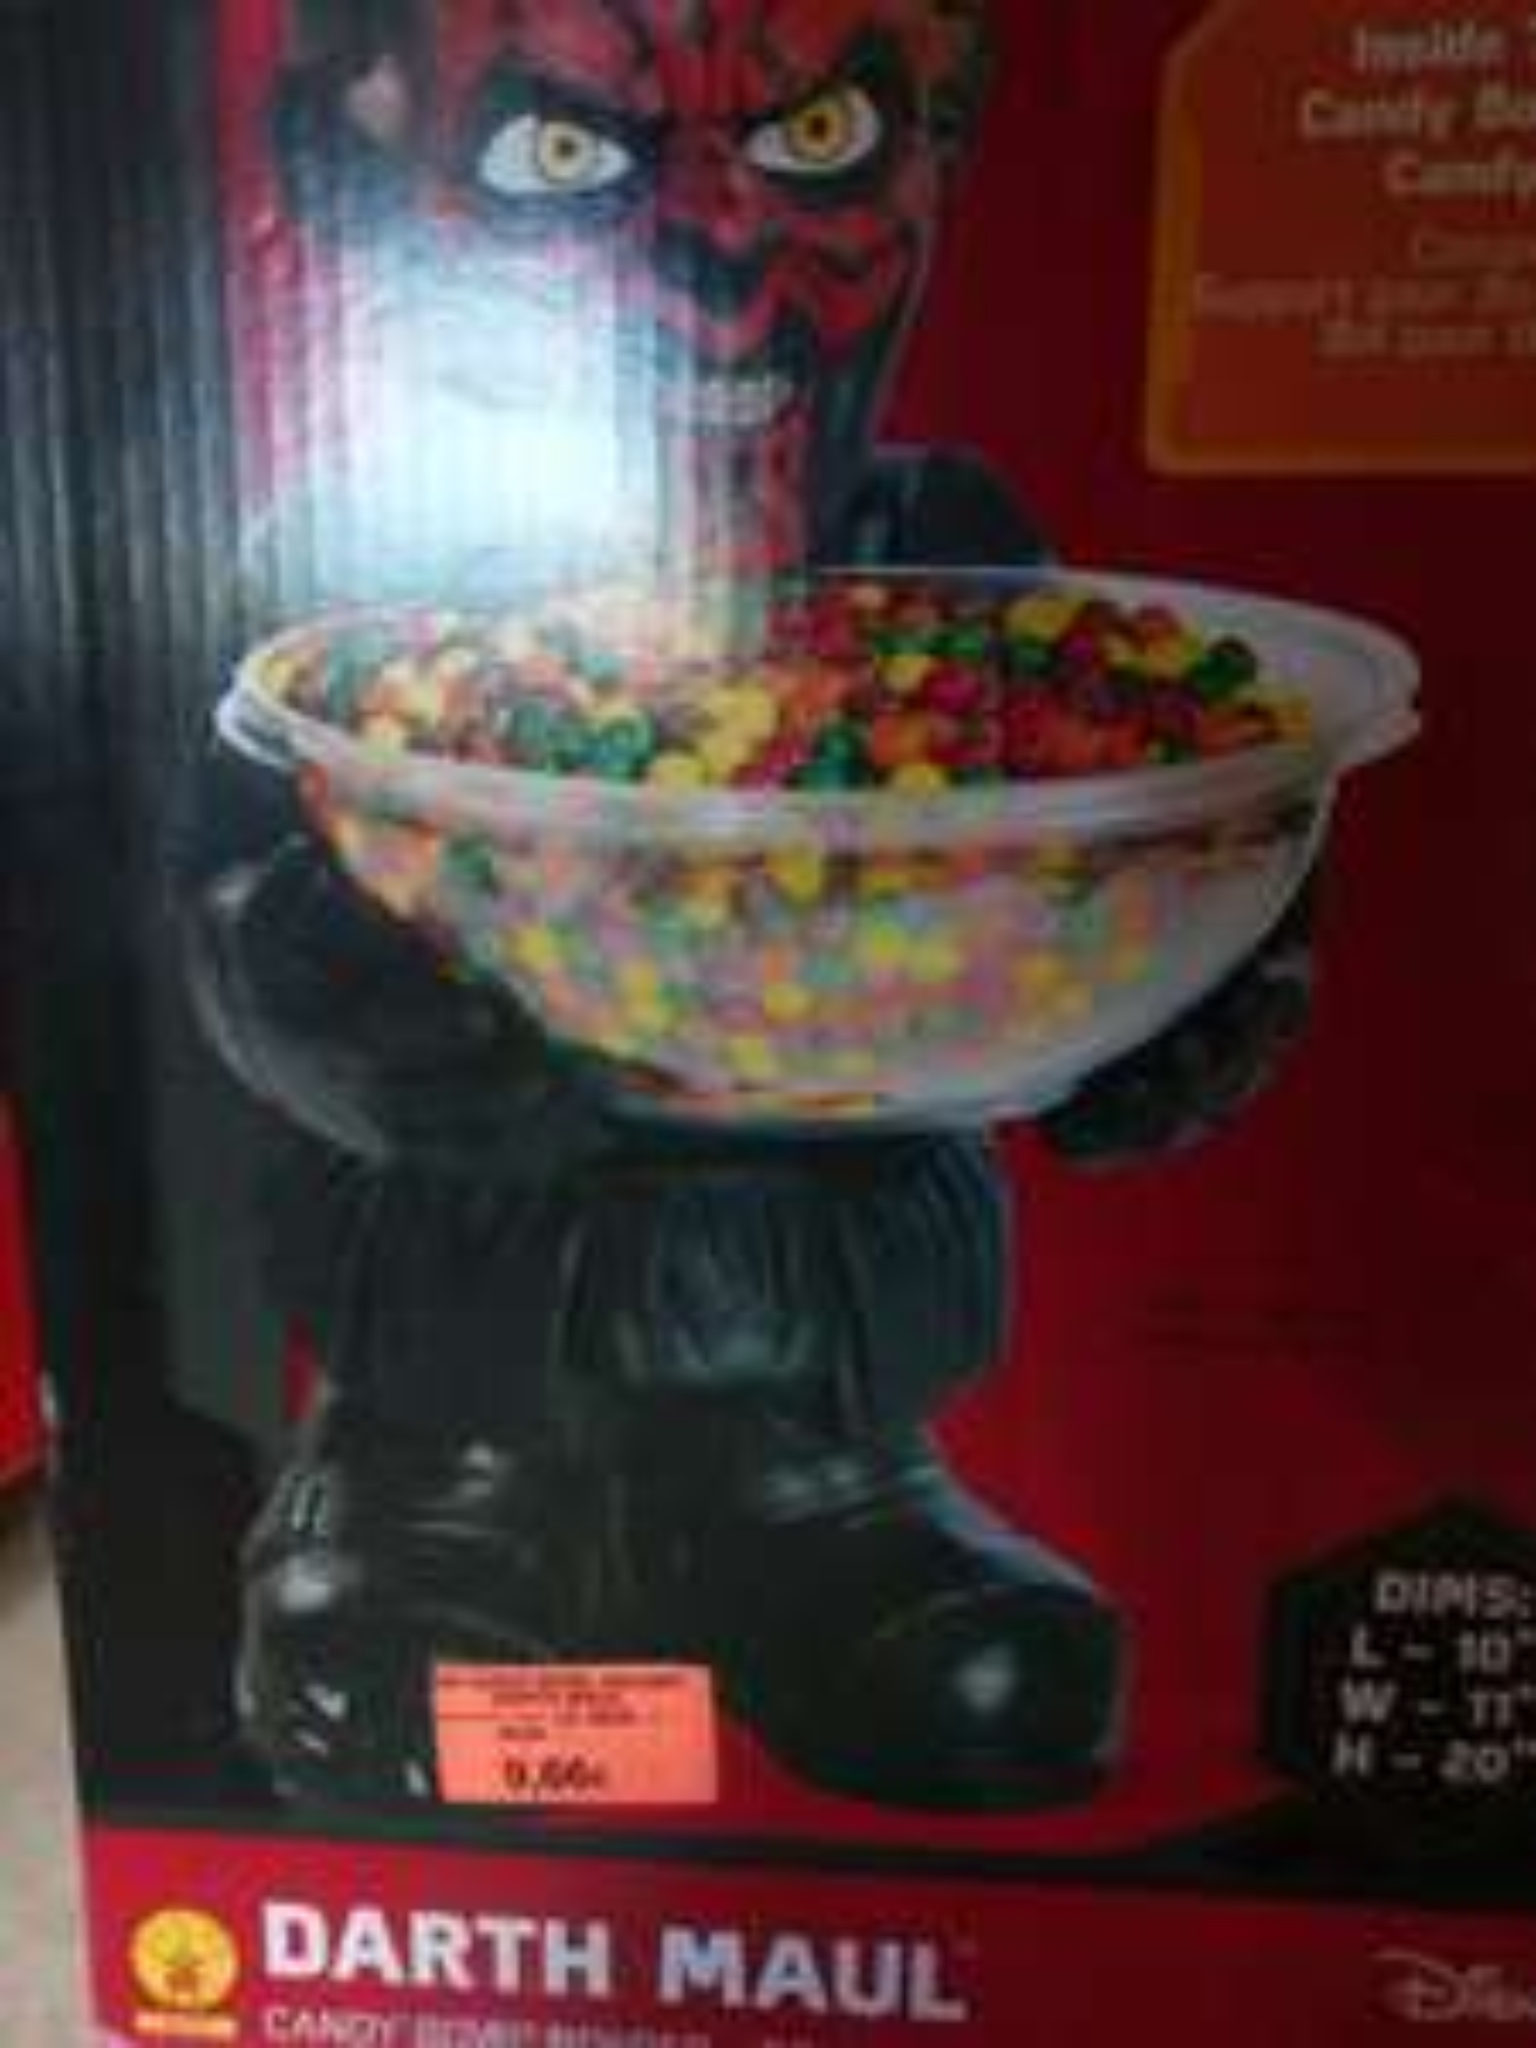 Darth Maul Süßigkeiten Halter Toy r us (Lokal)?